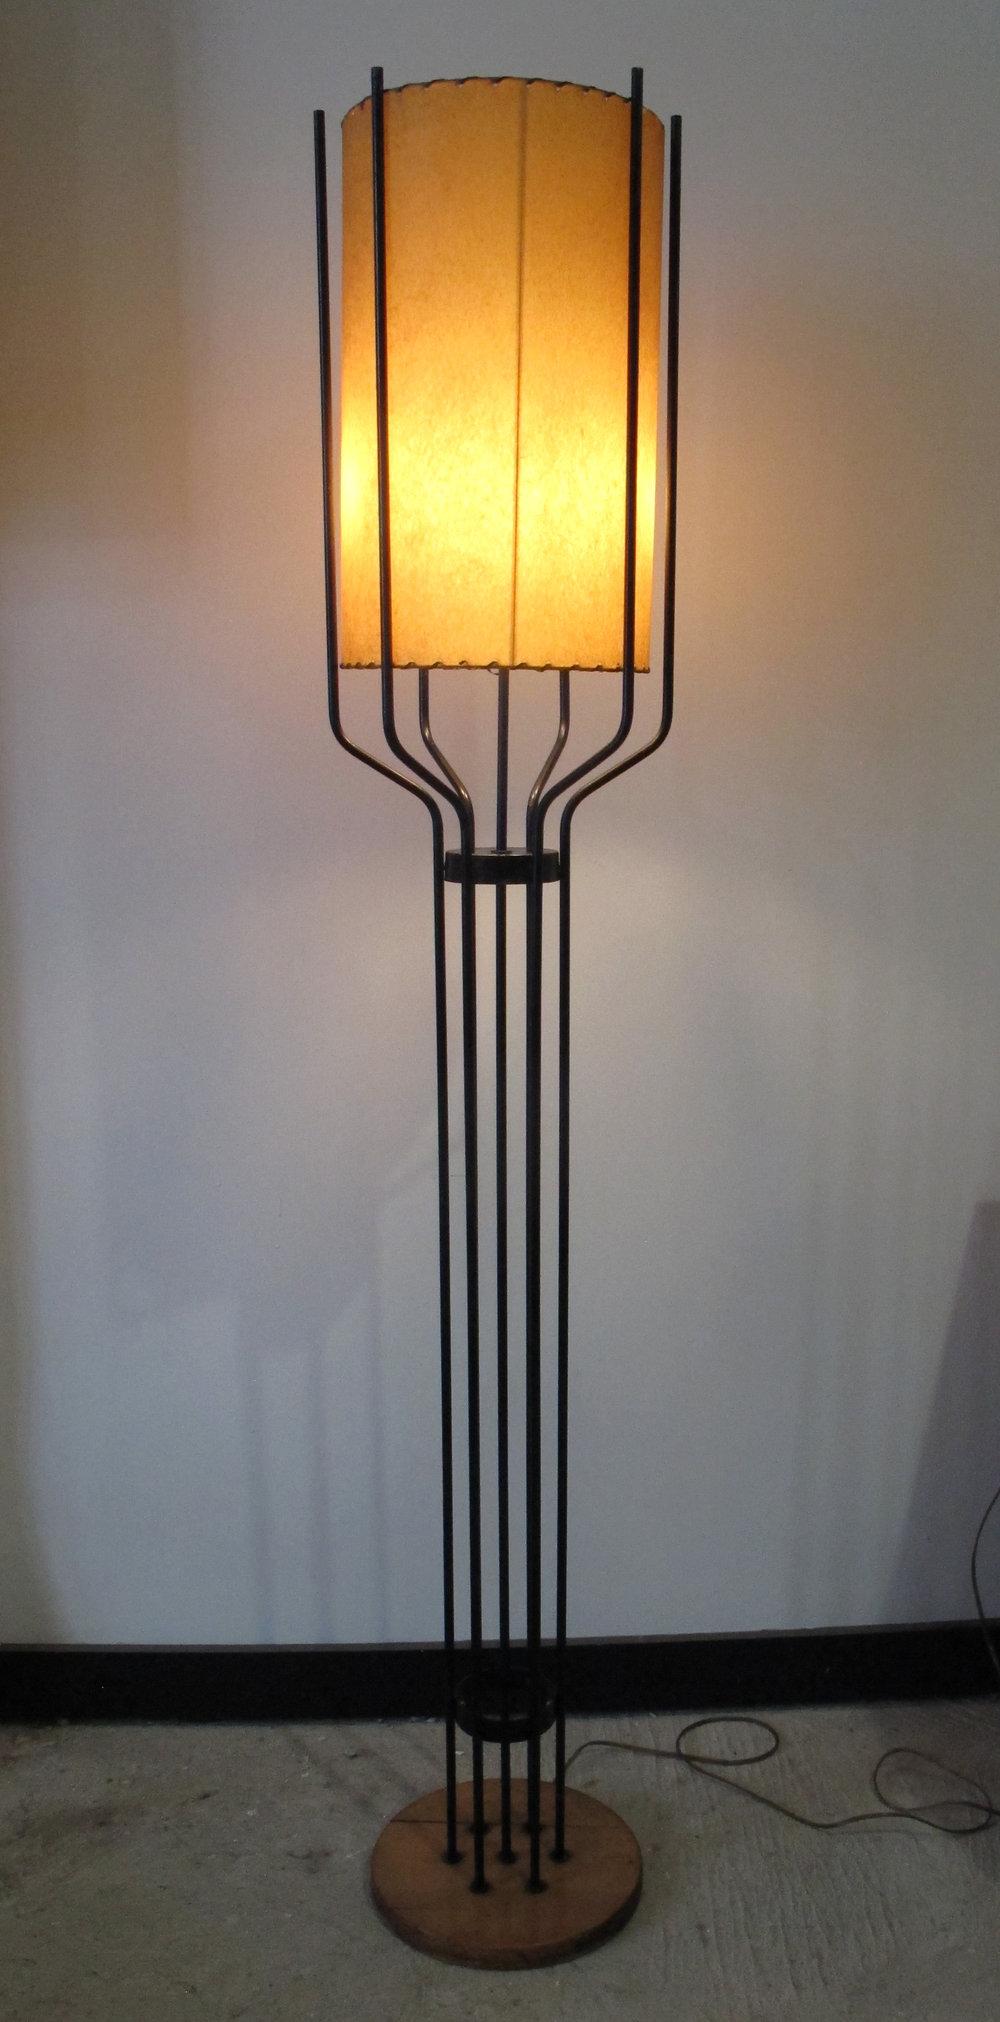 MID CENTURY IRON AND WOOD FLOOR LAMP